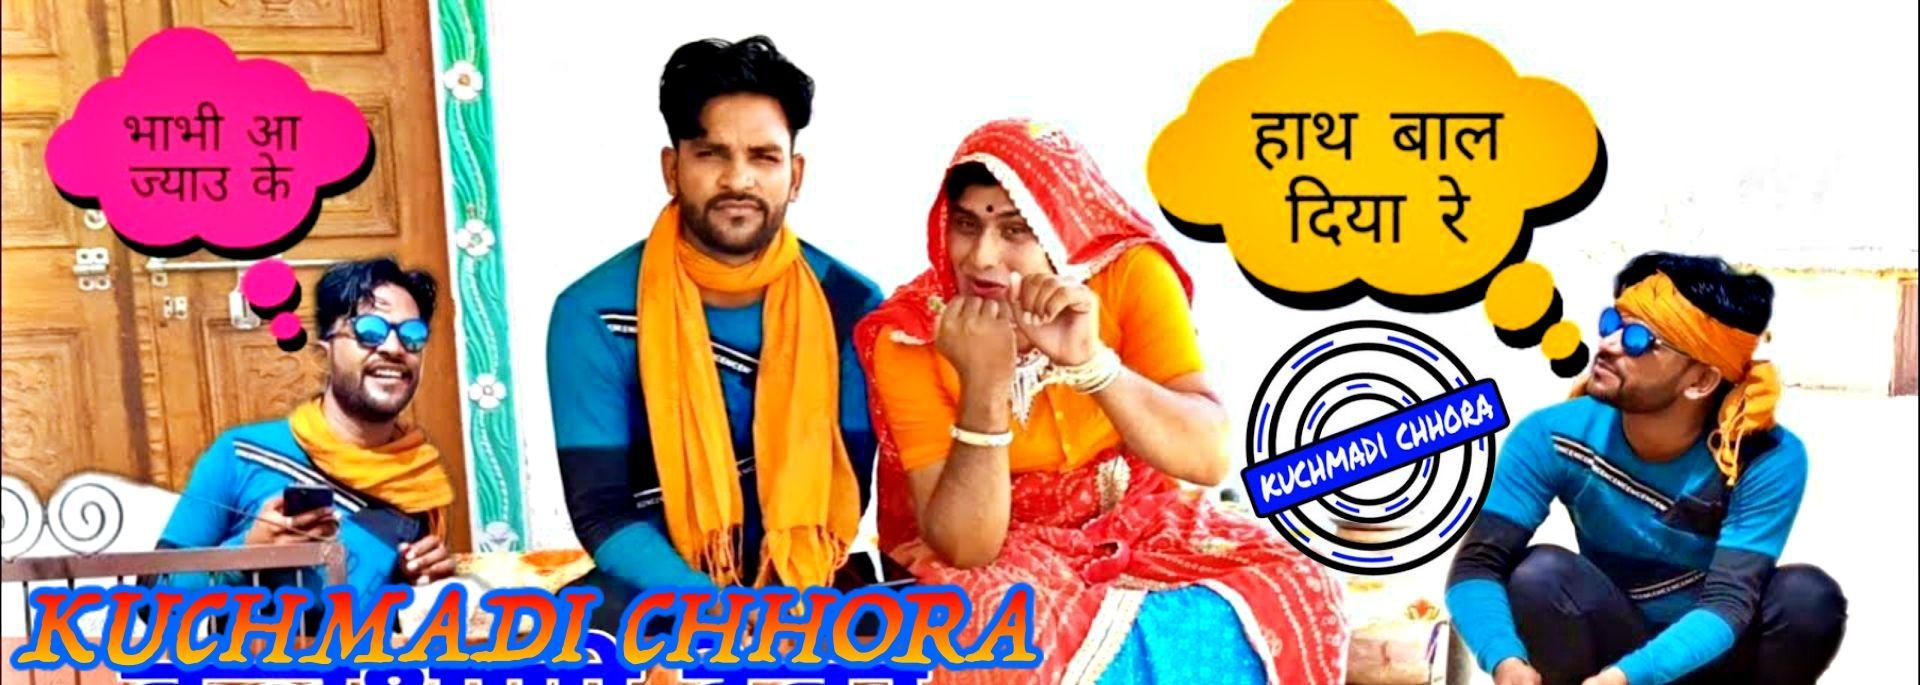 Kuchmadi Chhora channel